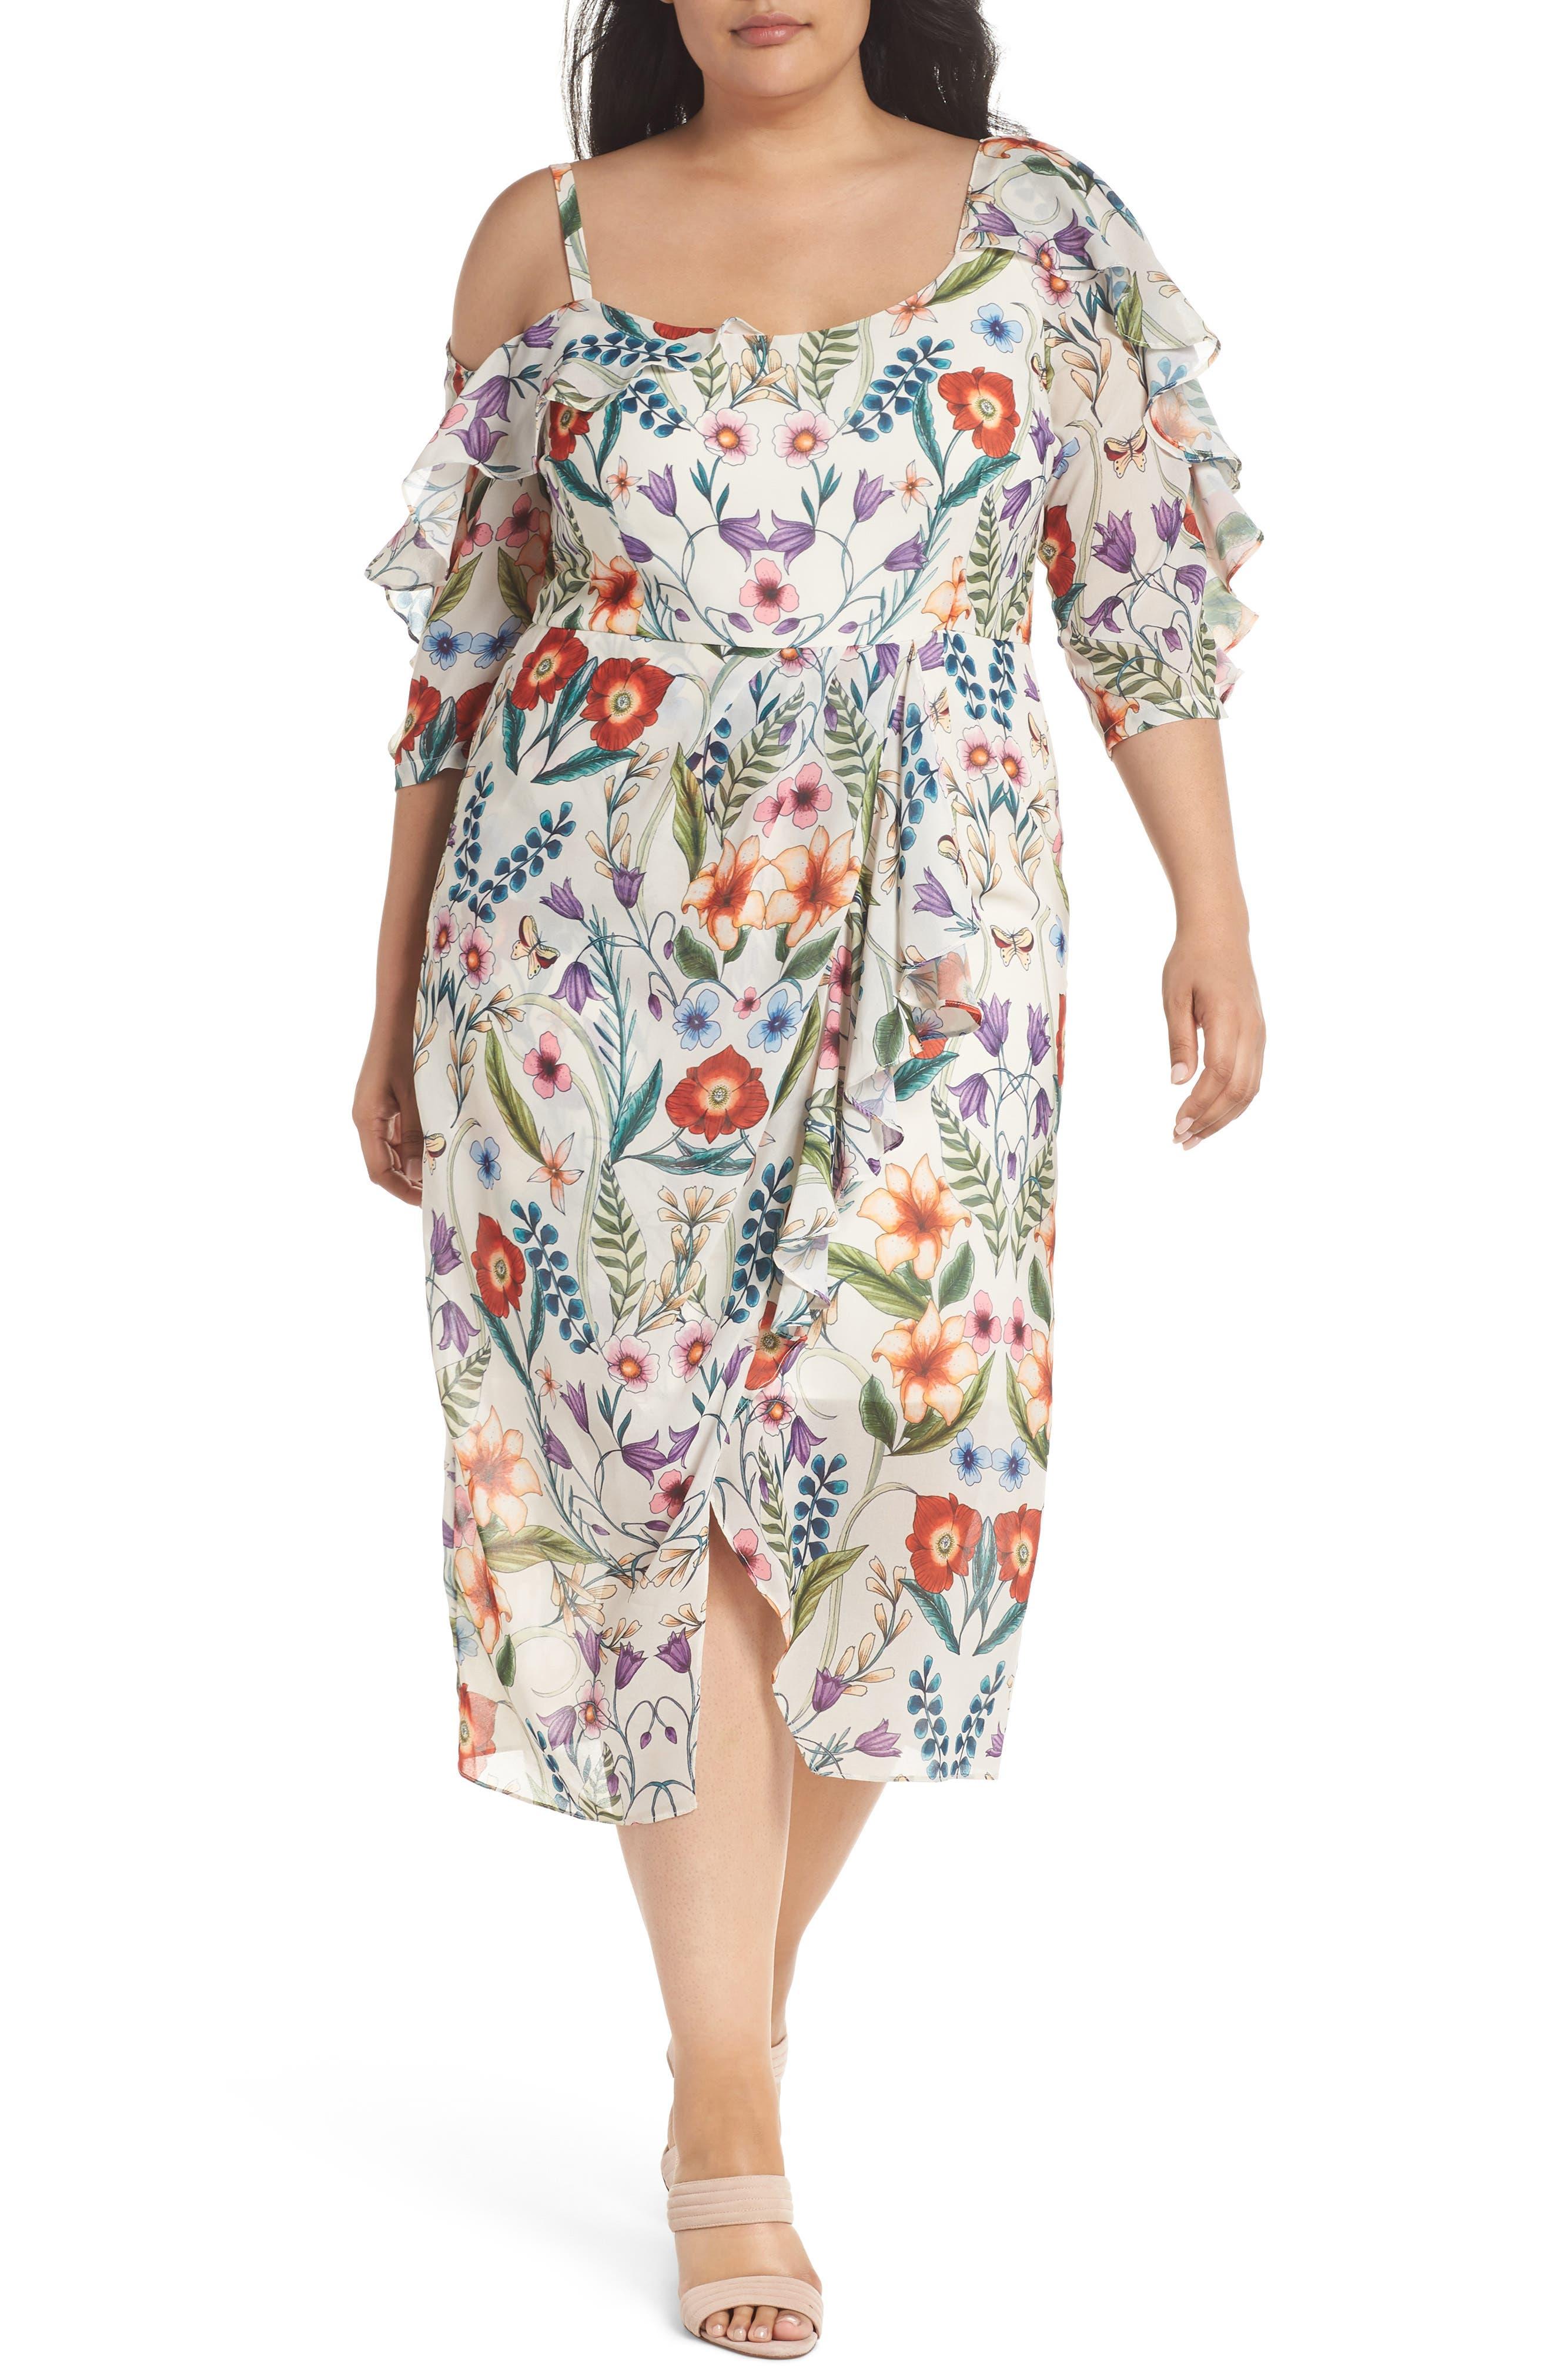 Gardenia Vintage Asymmetrical Dress,                             Main thumbnail 1, color,                             100